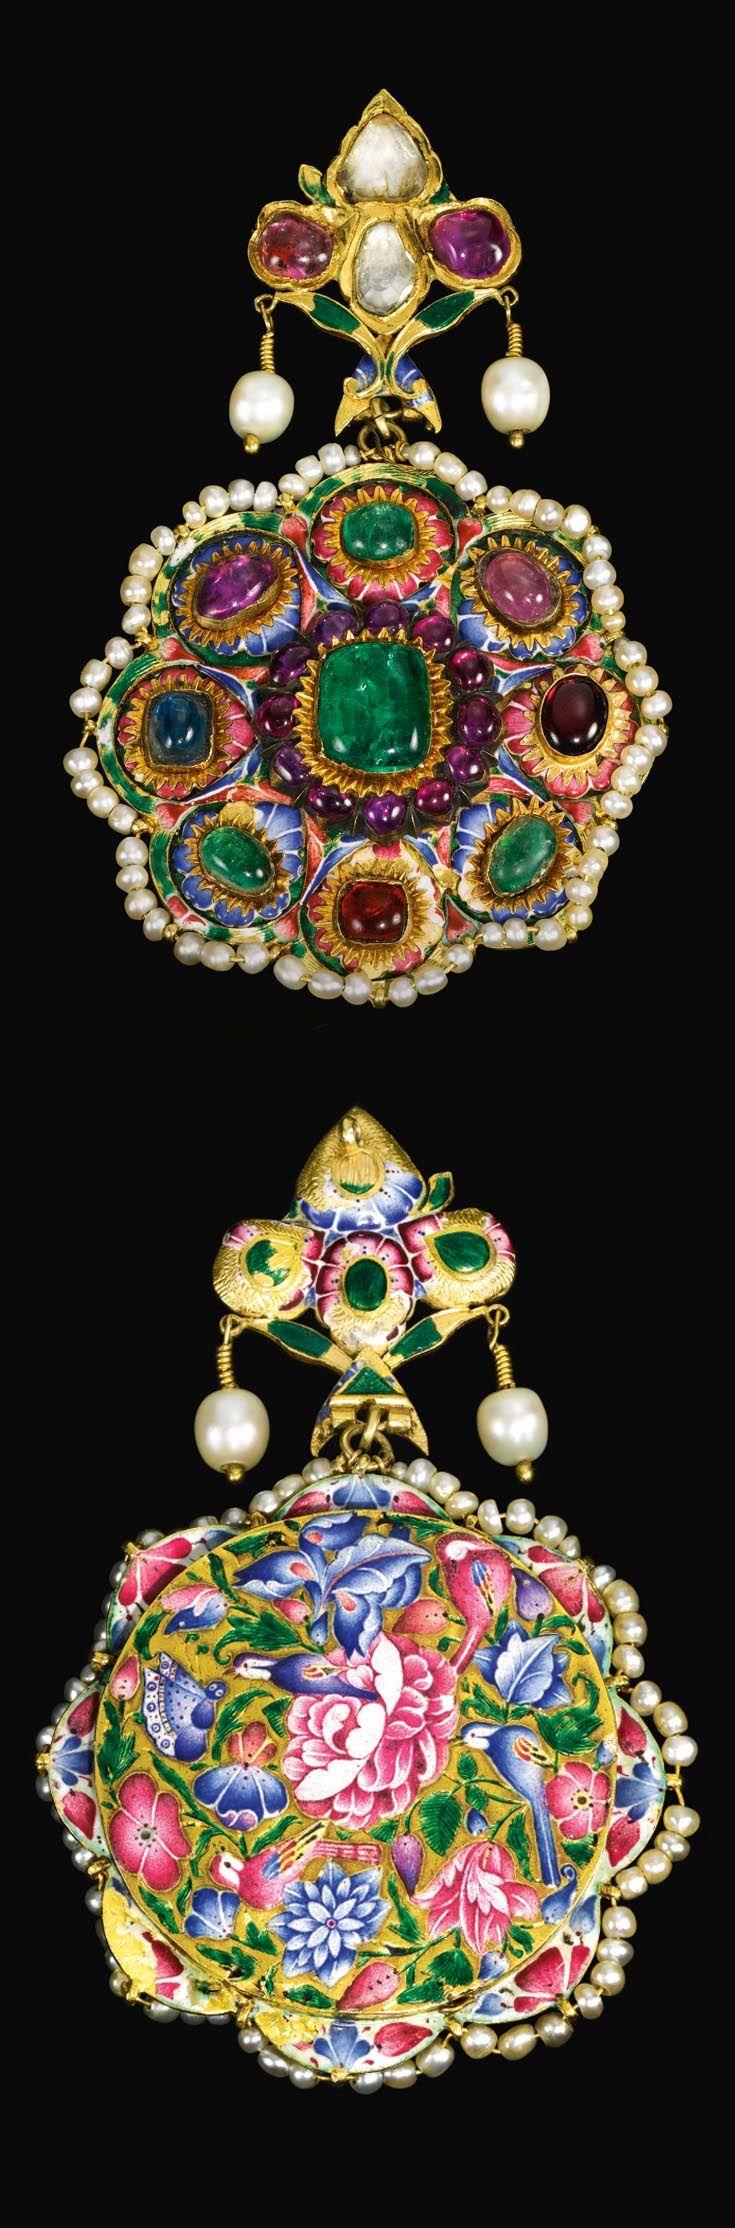 Persia   Large Qajar pendant; gemset gold and polychrome enamel   ca. 19th century   Est. 4'000 - 6'000£ ~ Oct '15